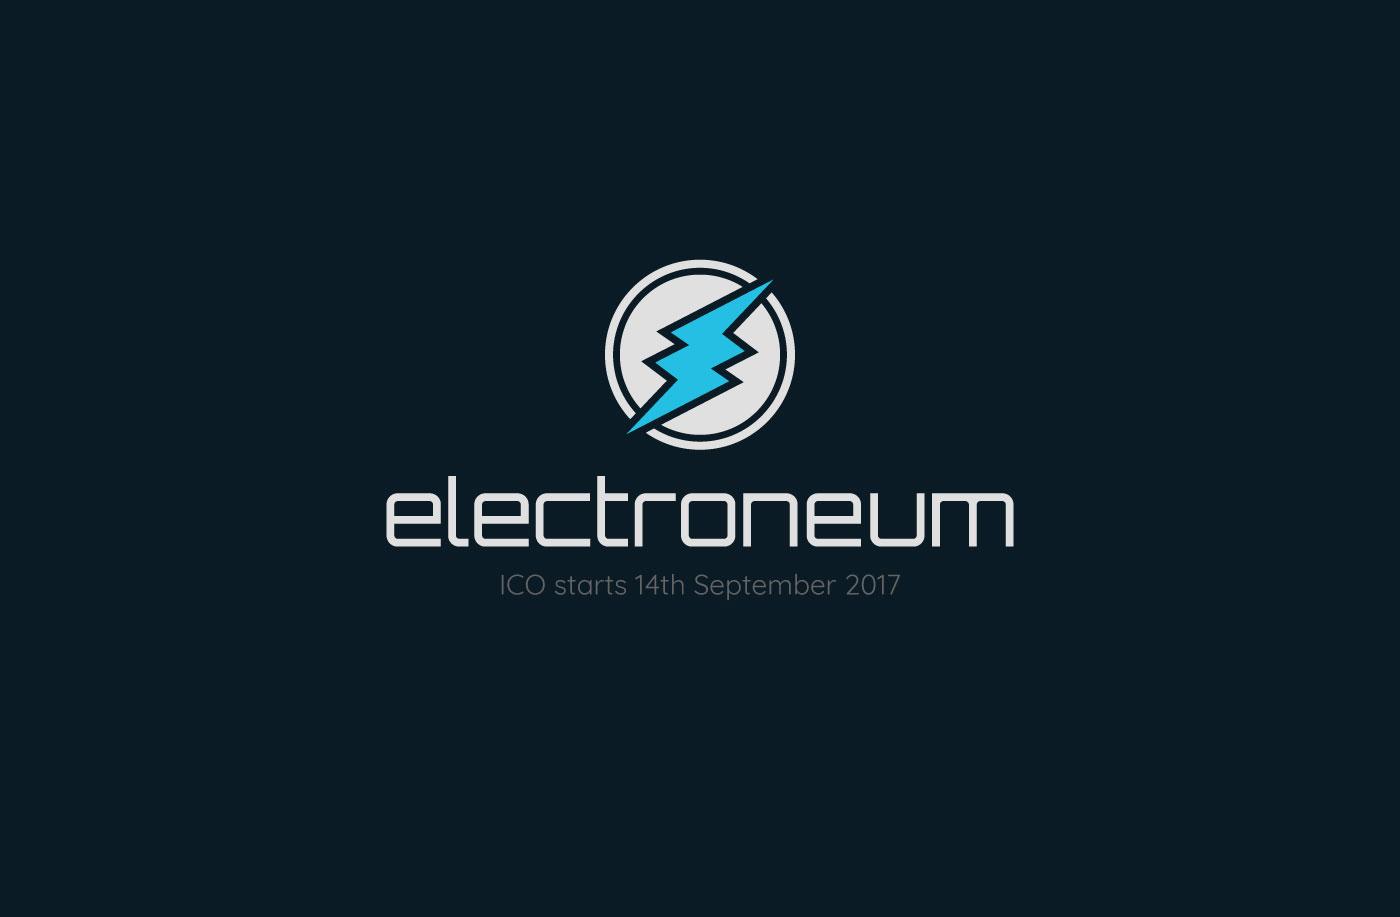 Electroneum kopen